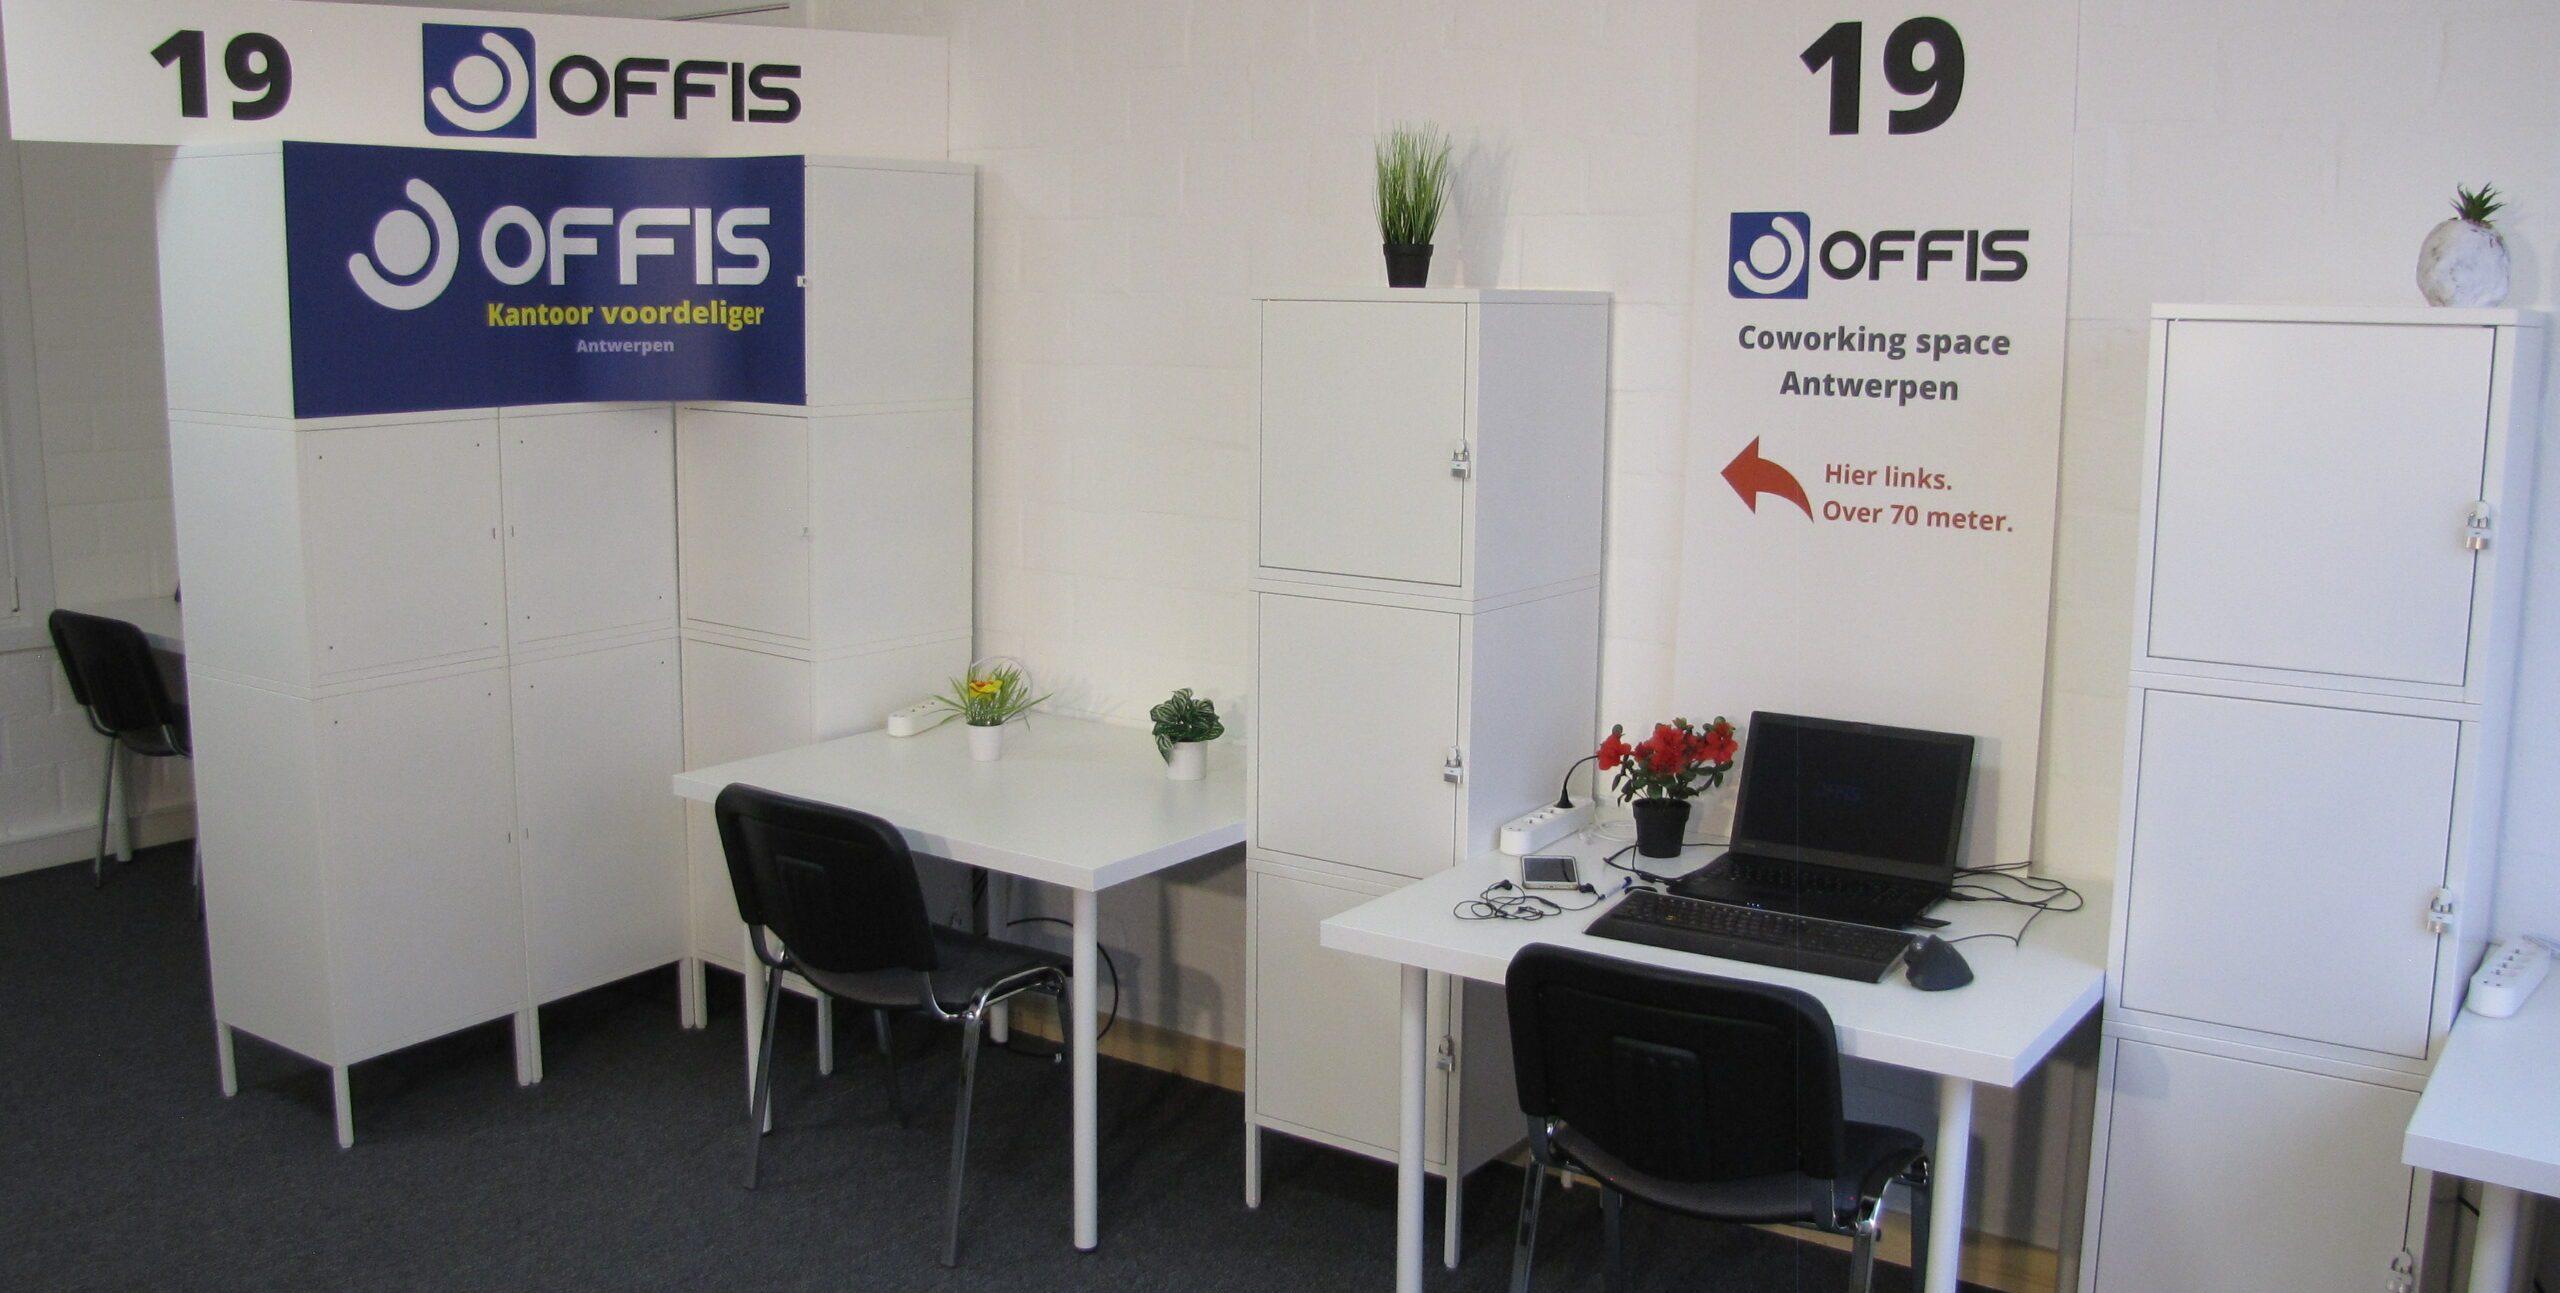 Werkplek bij business center offis in Antwerpen